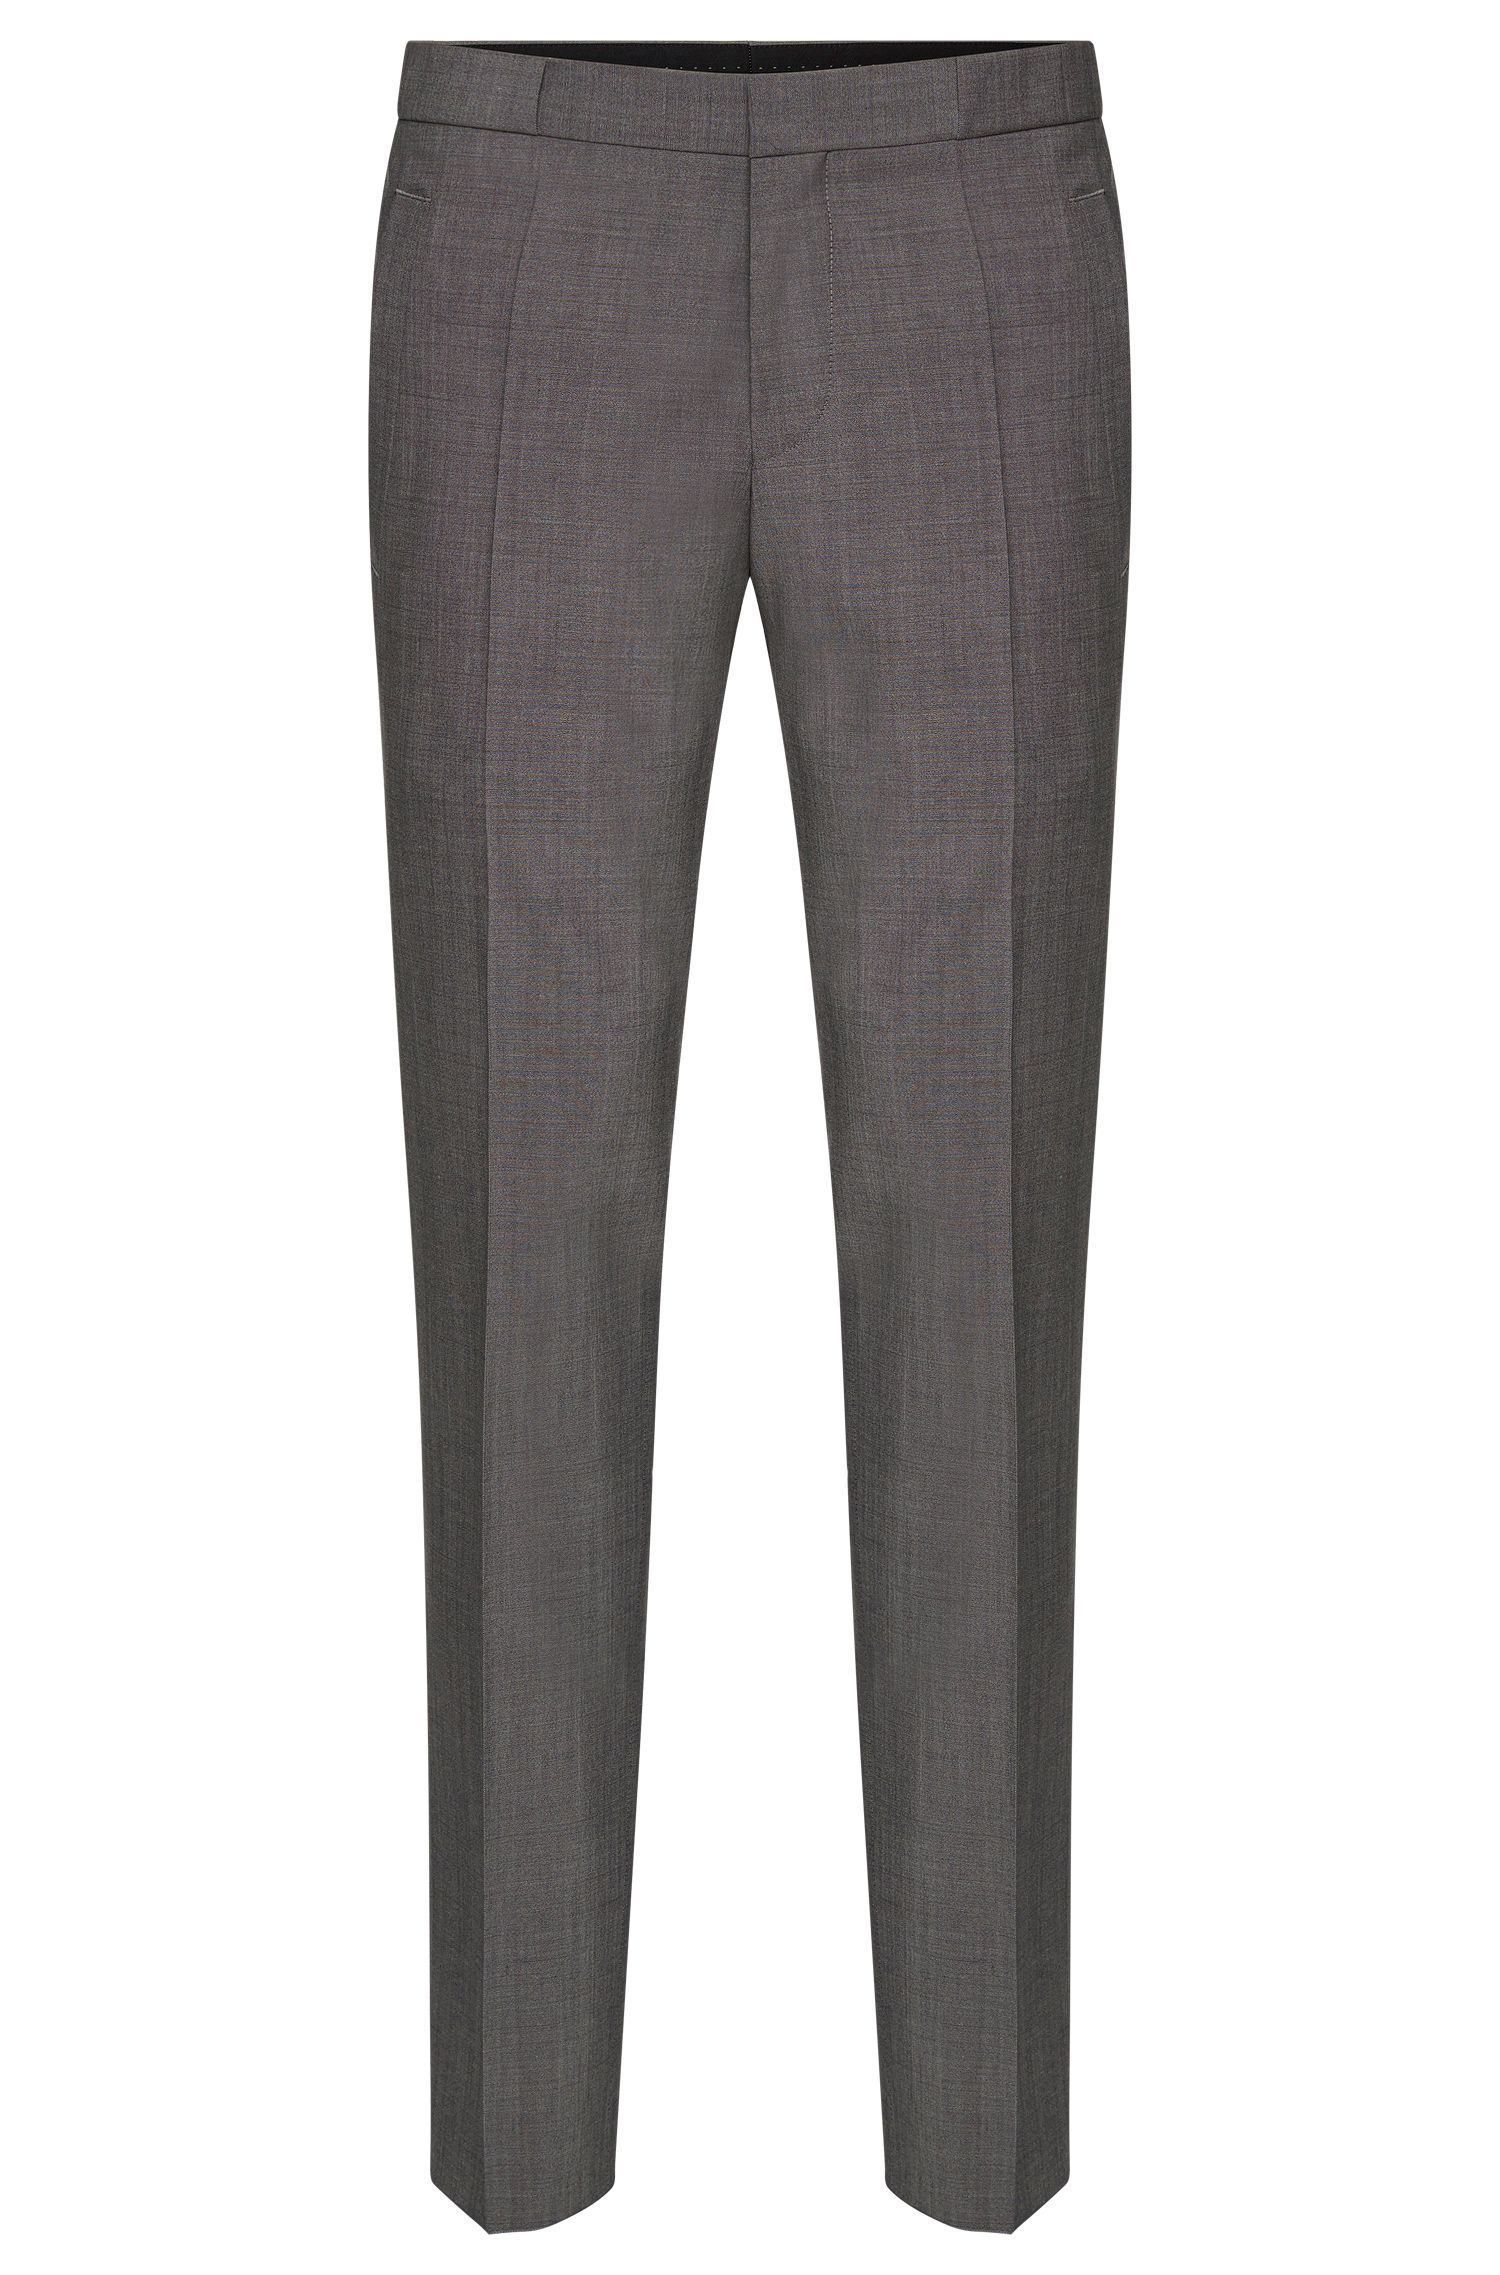 'Braydon'   Slim Fit, Virgin Wool Mohair Dress Pants